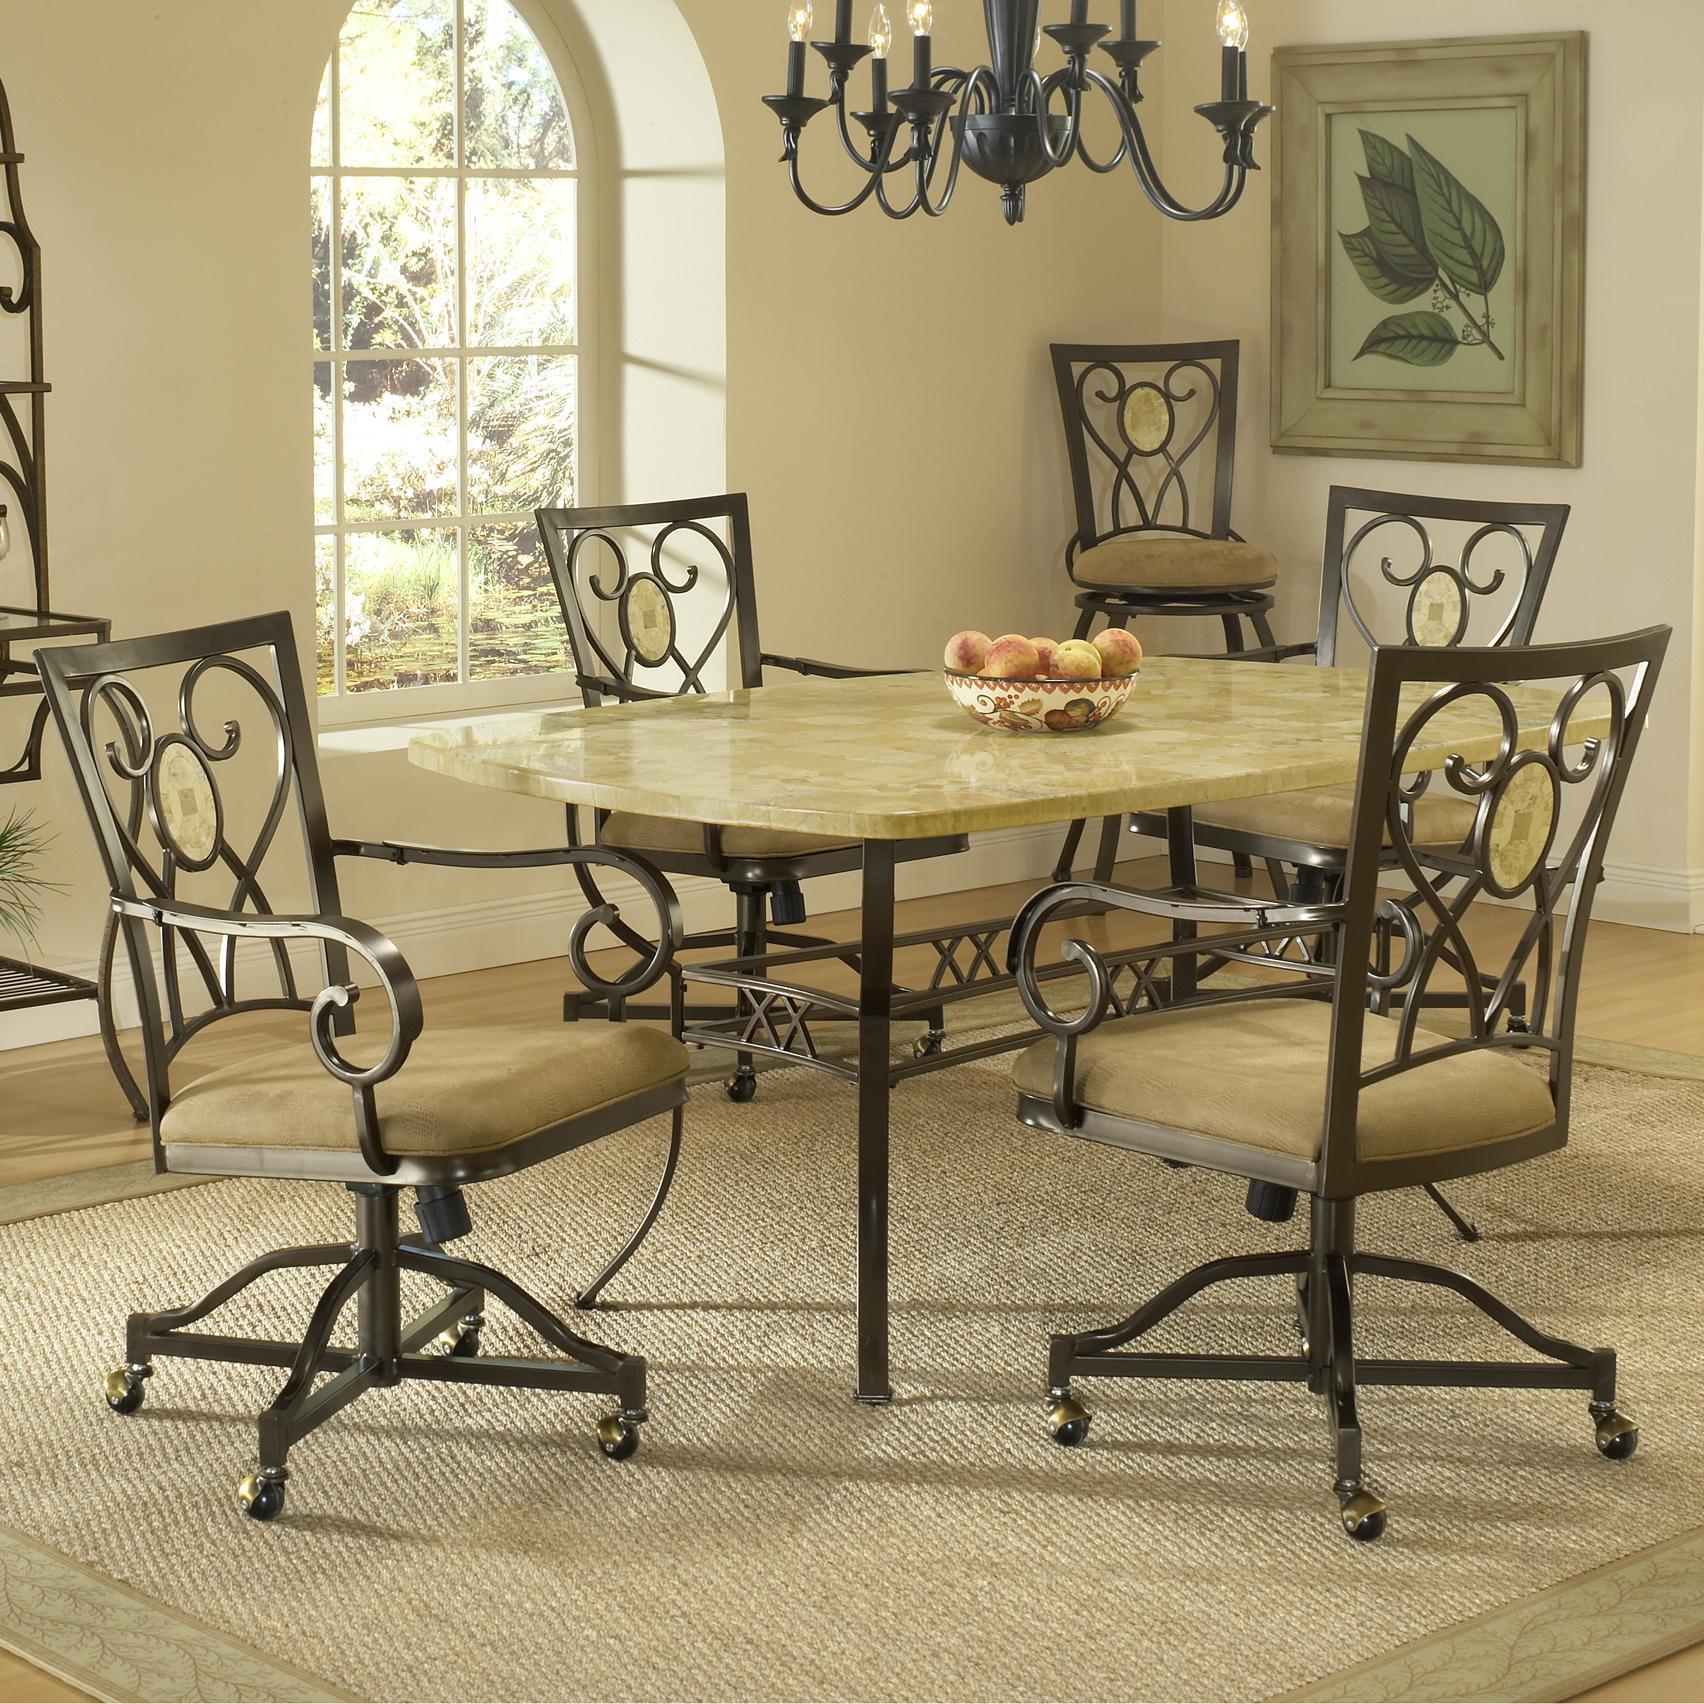 Hillsdale Brookside Five Piece Rectangle Dining Set - Item Number: 4815DTBCOVC